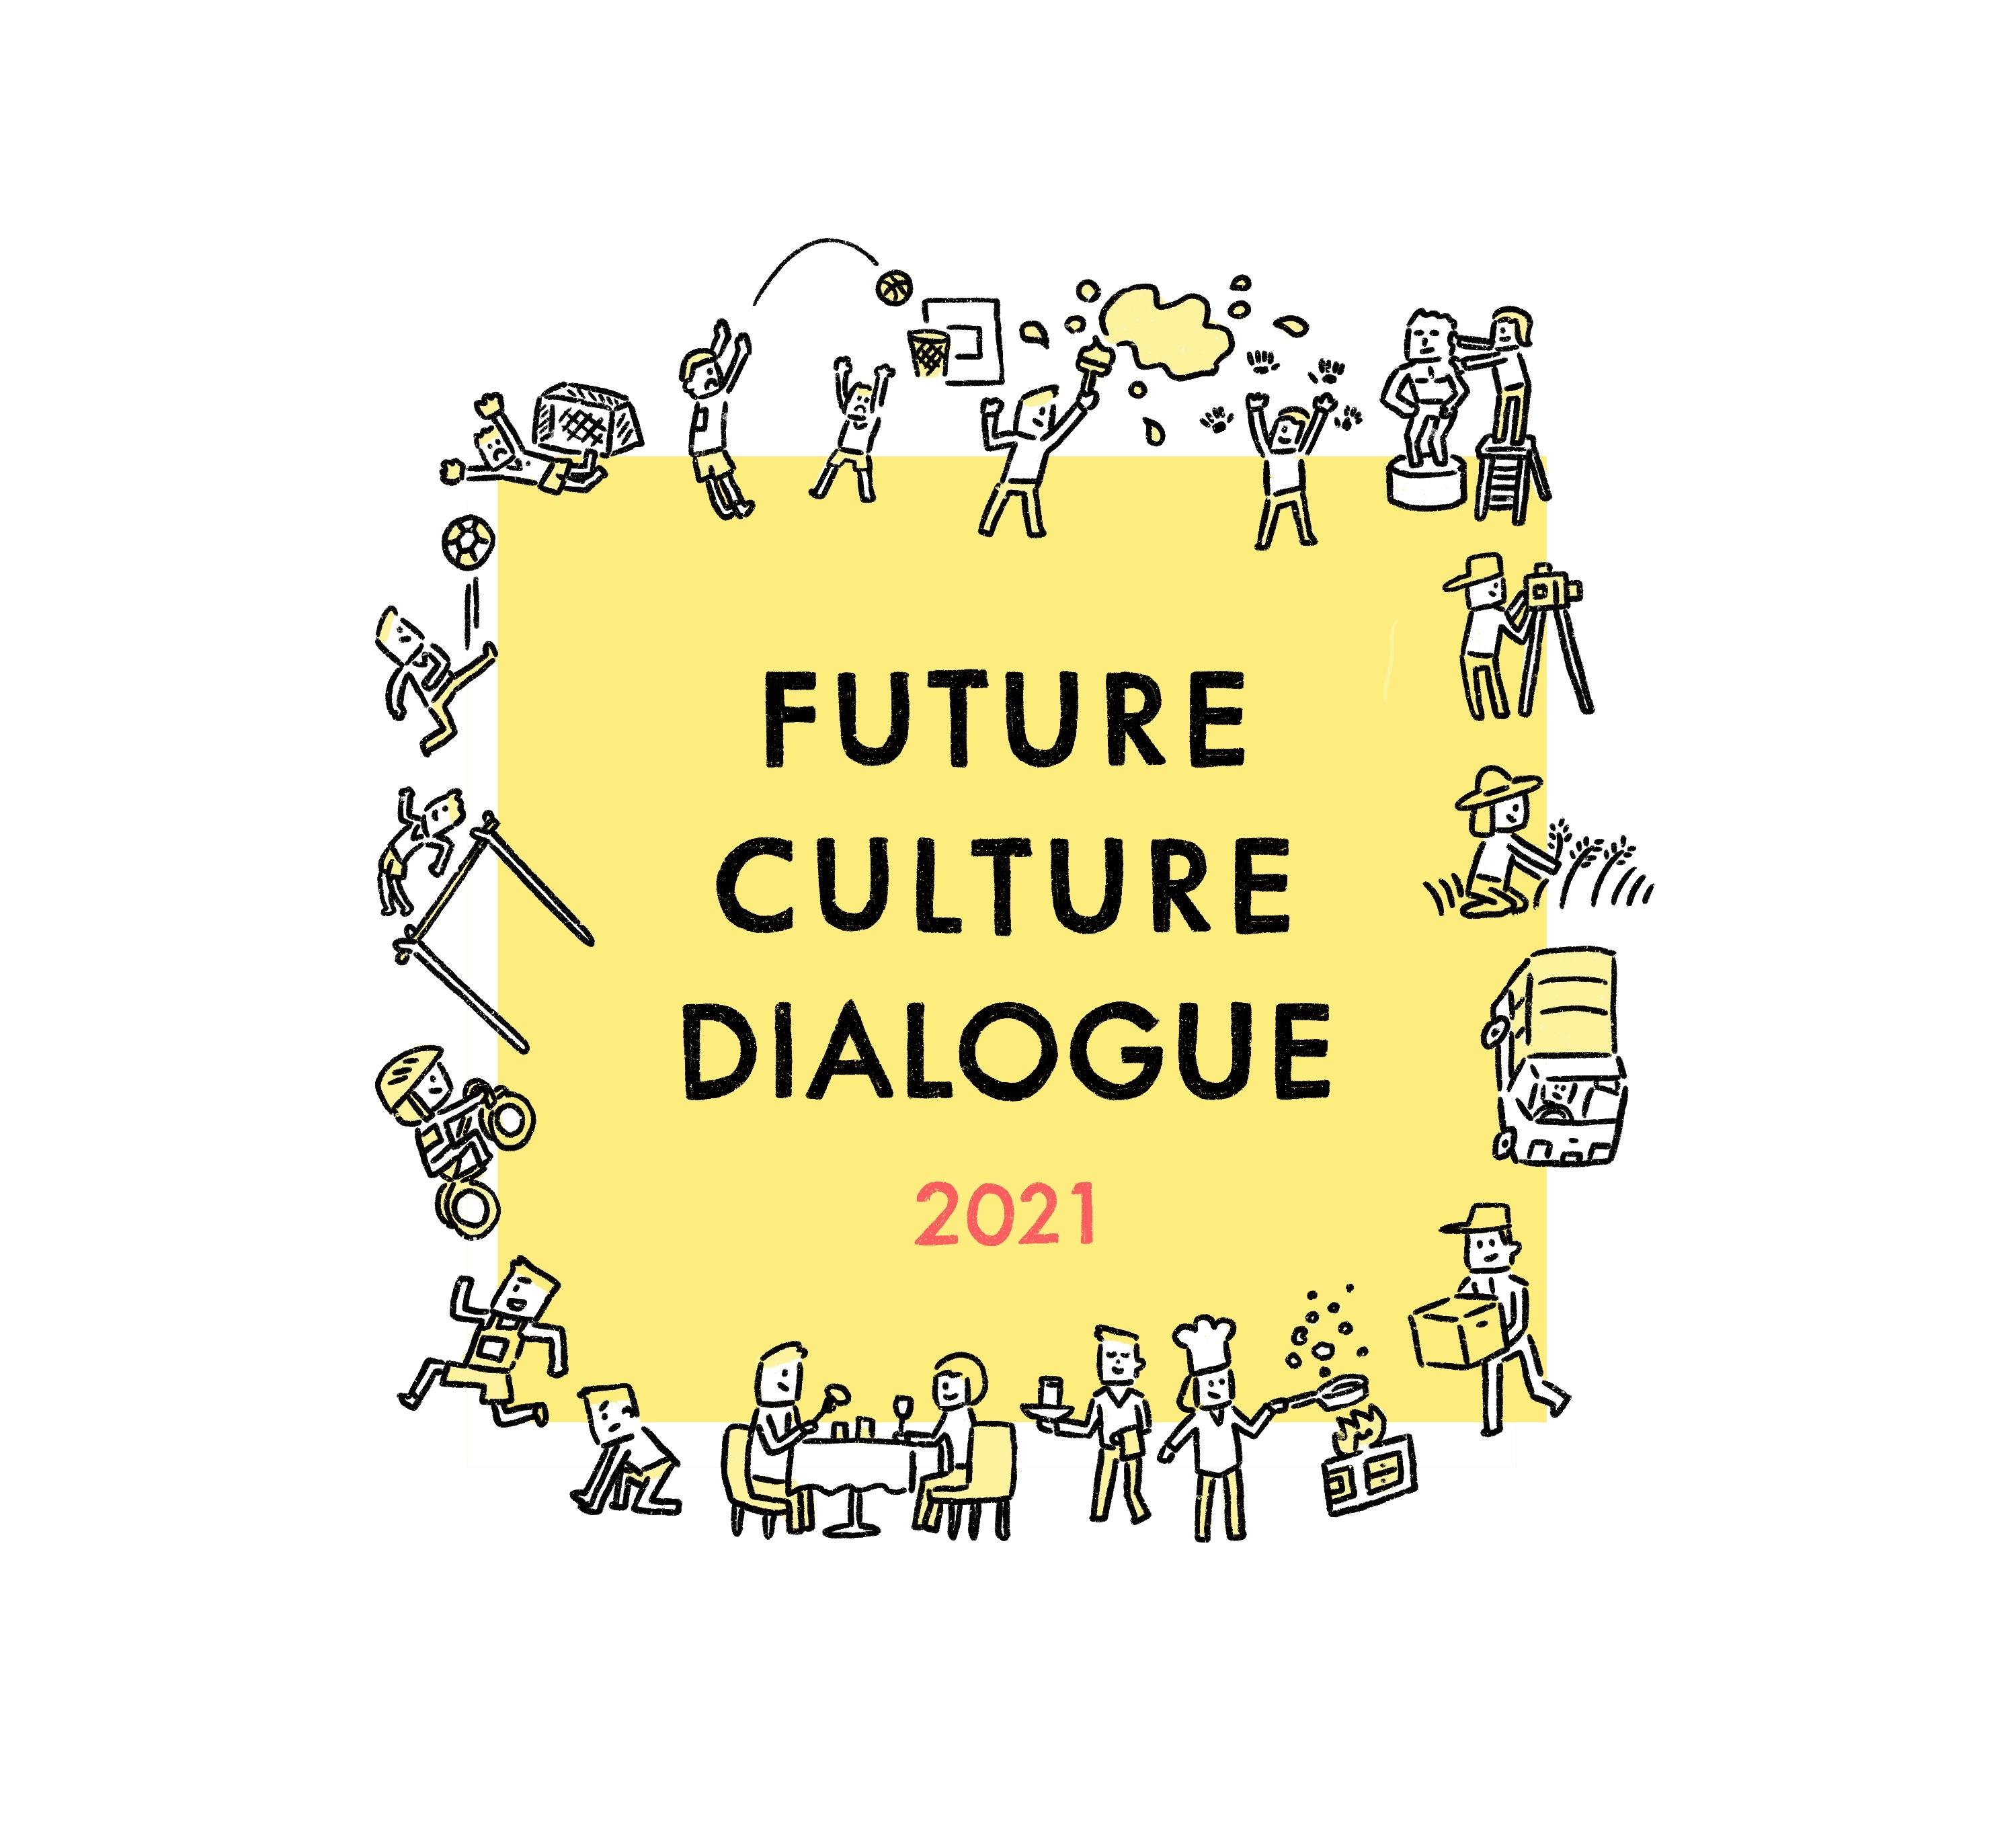 FUTURE CULTURE DIALOGUE 2021